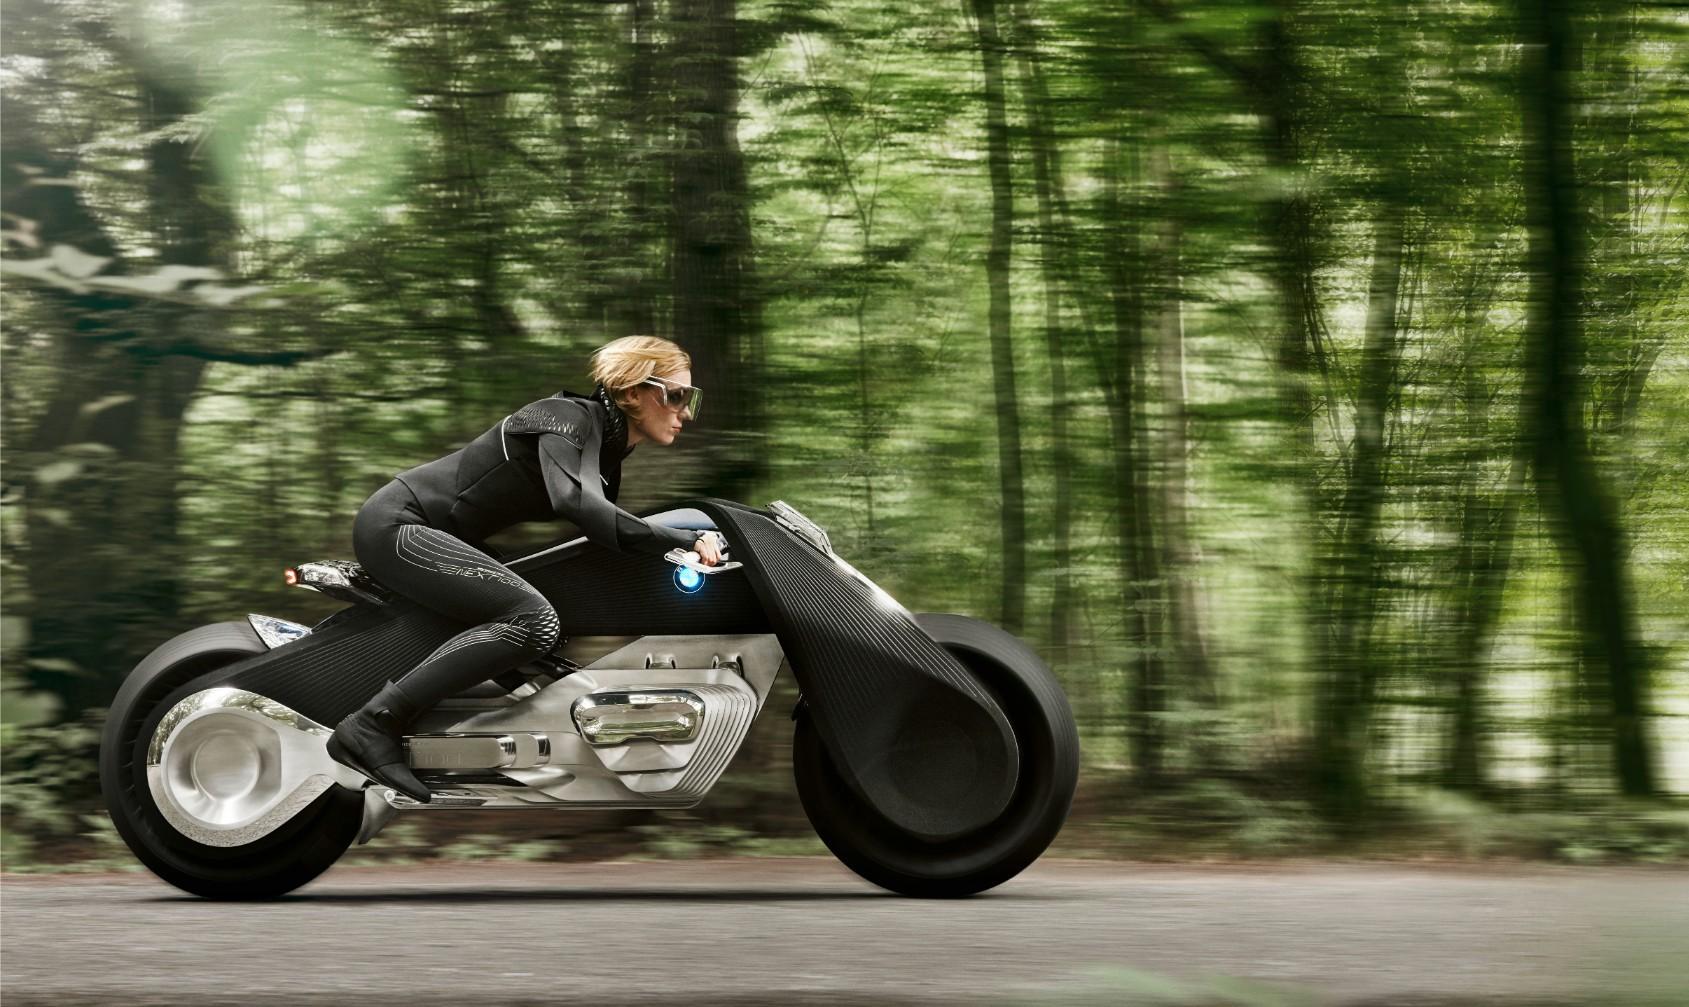 Šef BMW Motorrad: Nećemo praviti električne motocikle